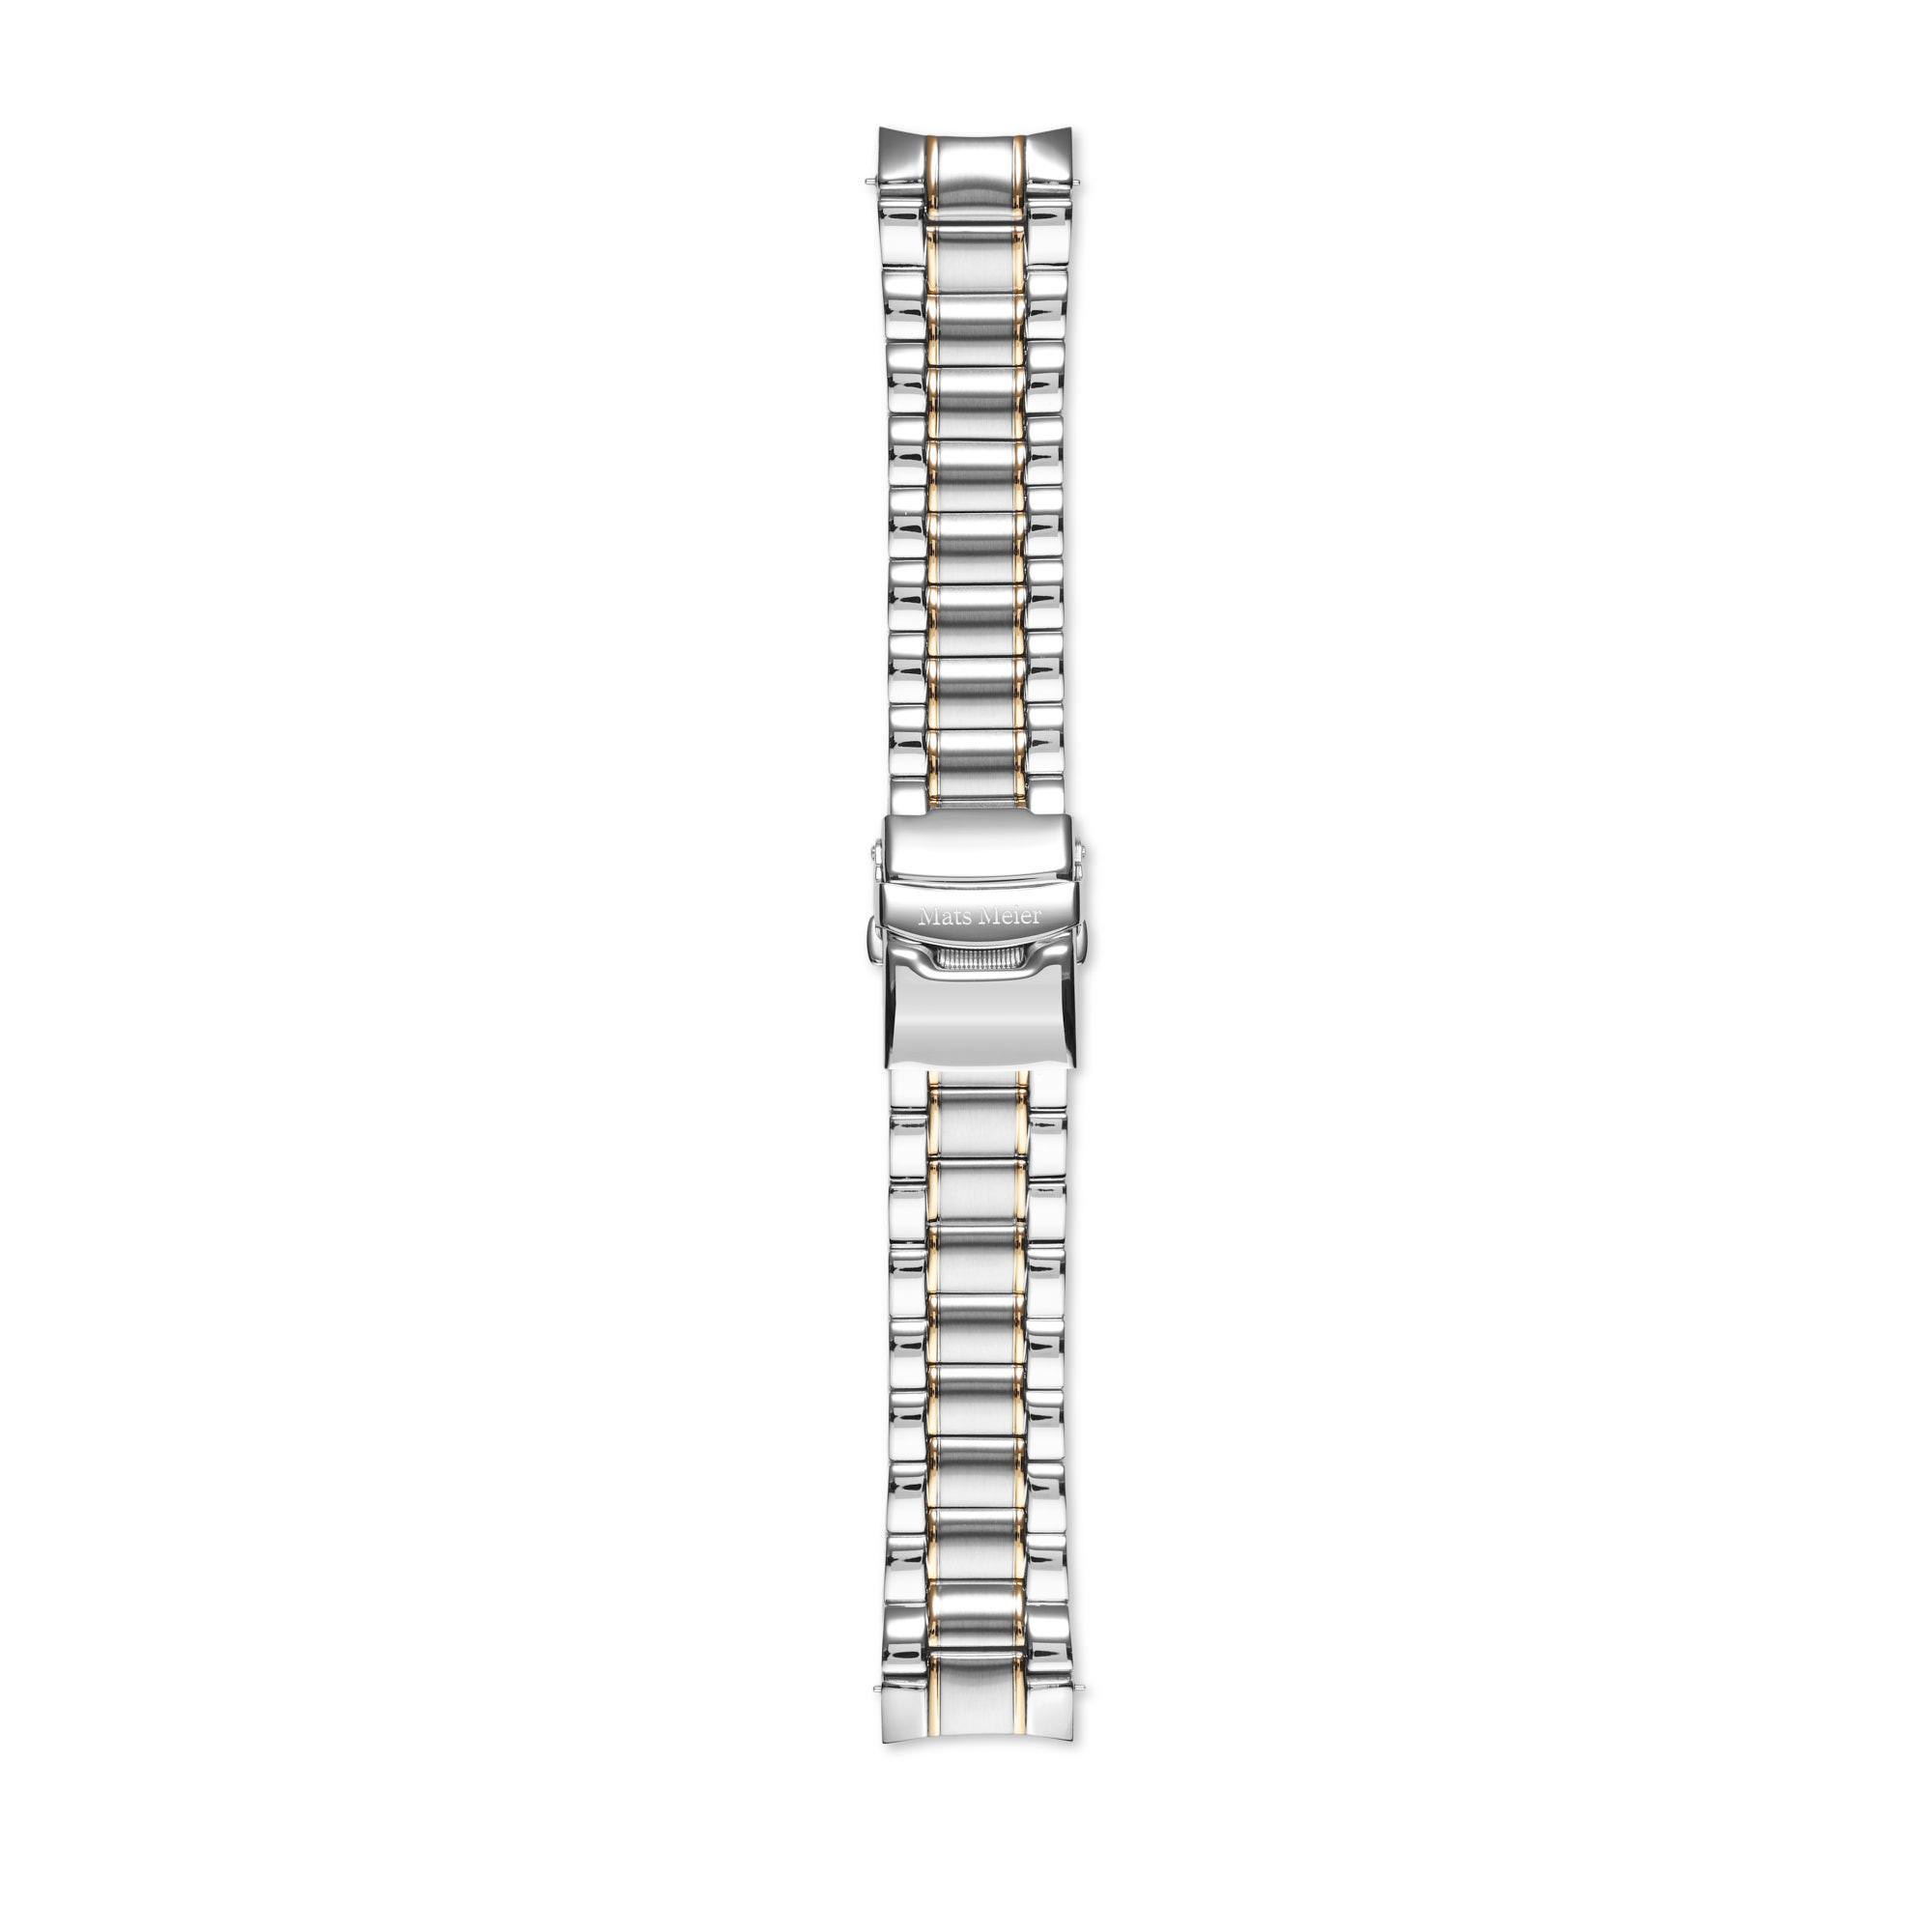 Mats Meier Ponte Dei Salti rem i rustfrit stål 22 mm sølvfarvet